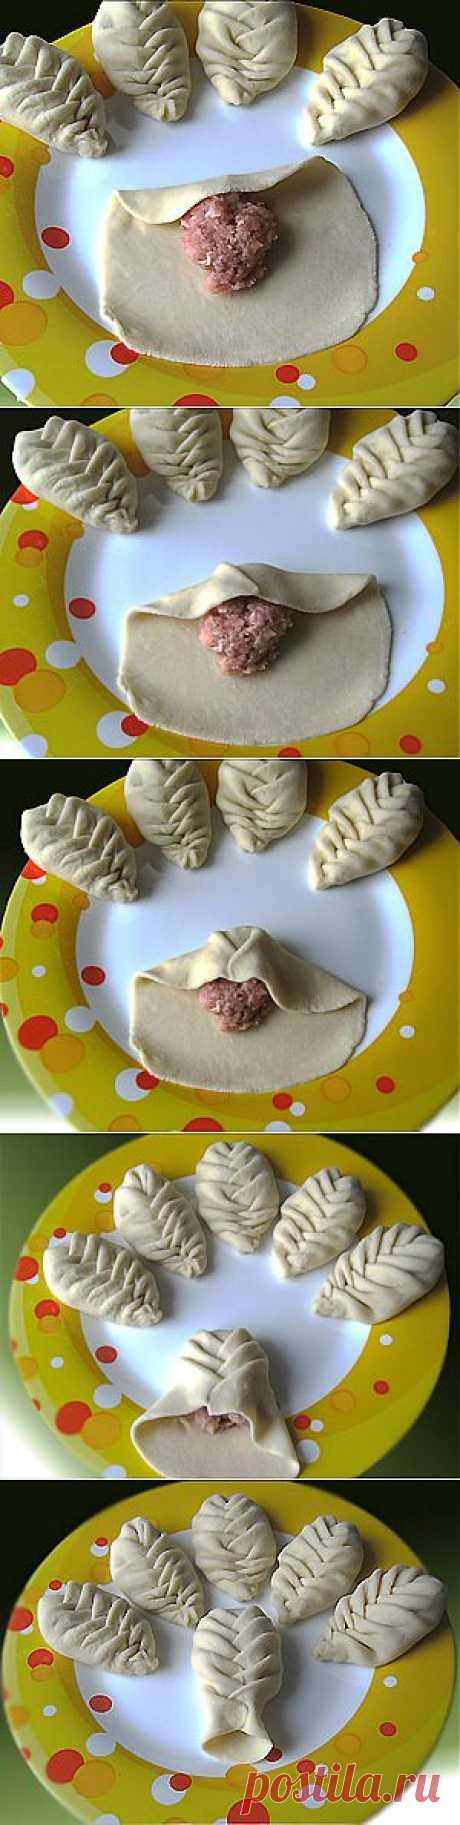 We swaddle pelmeni, manti, pies | our house